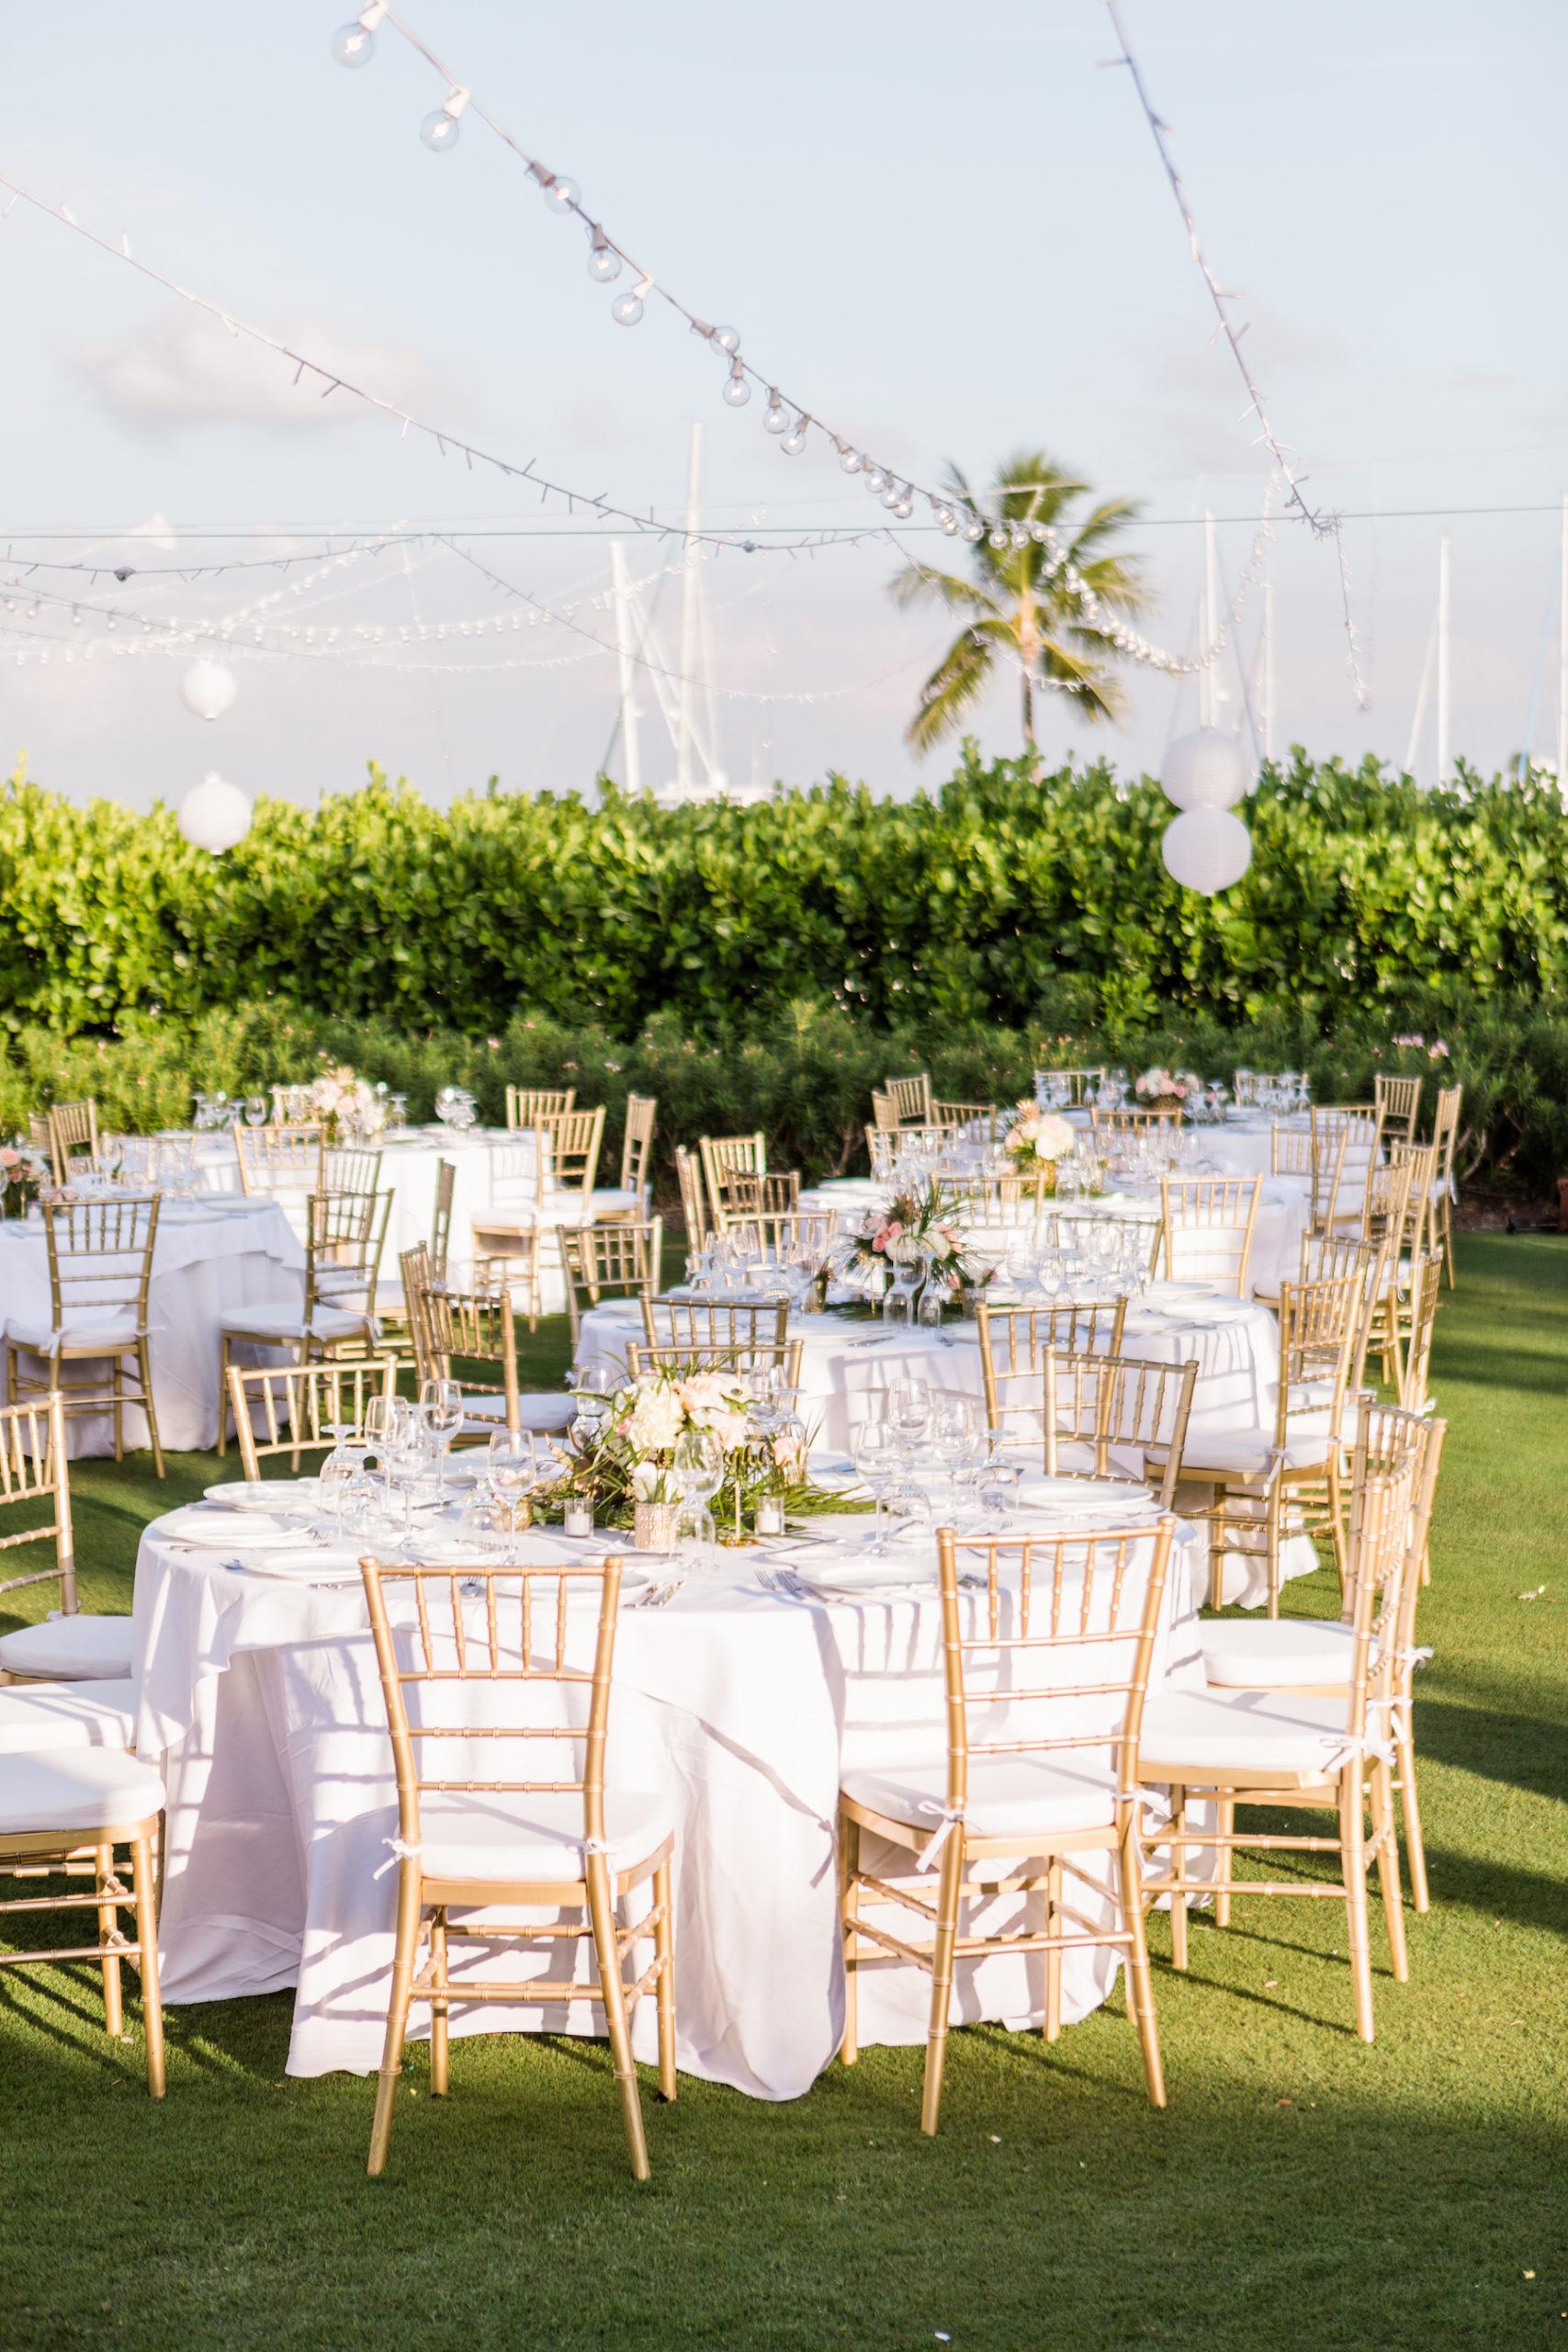 Elegant Outdoor Florida Lawn Wedding Reception with ...